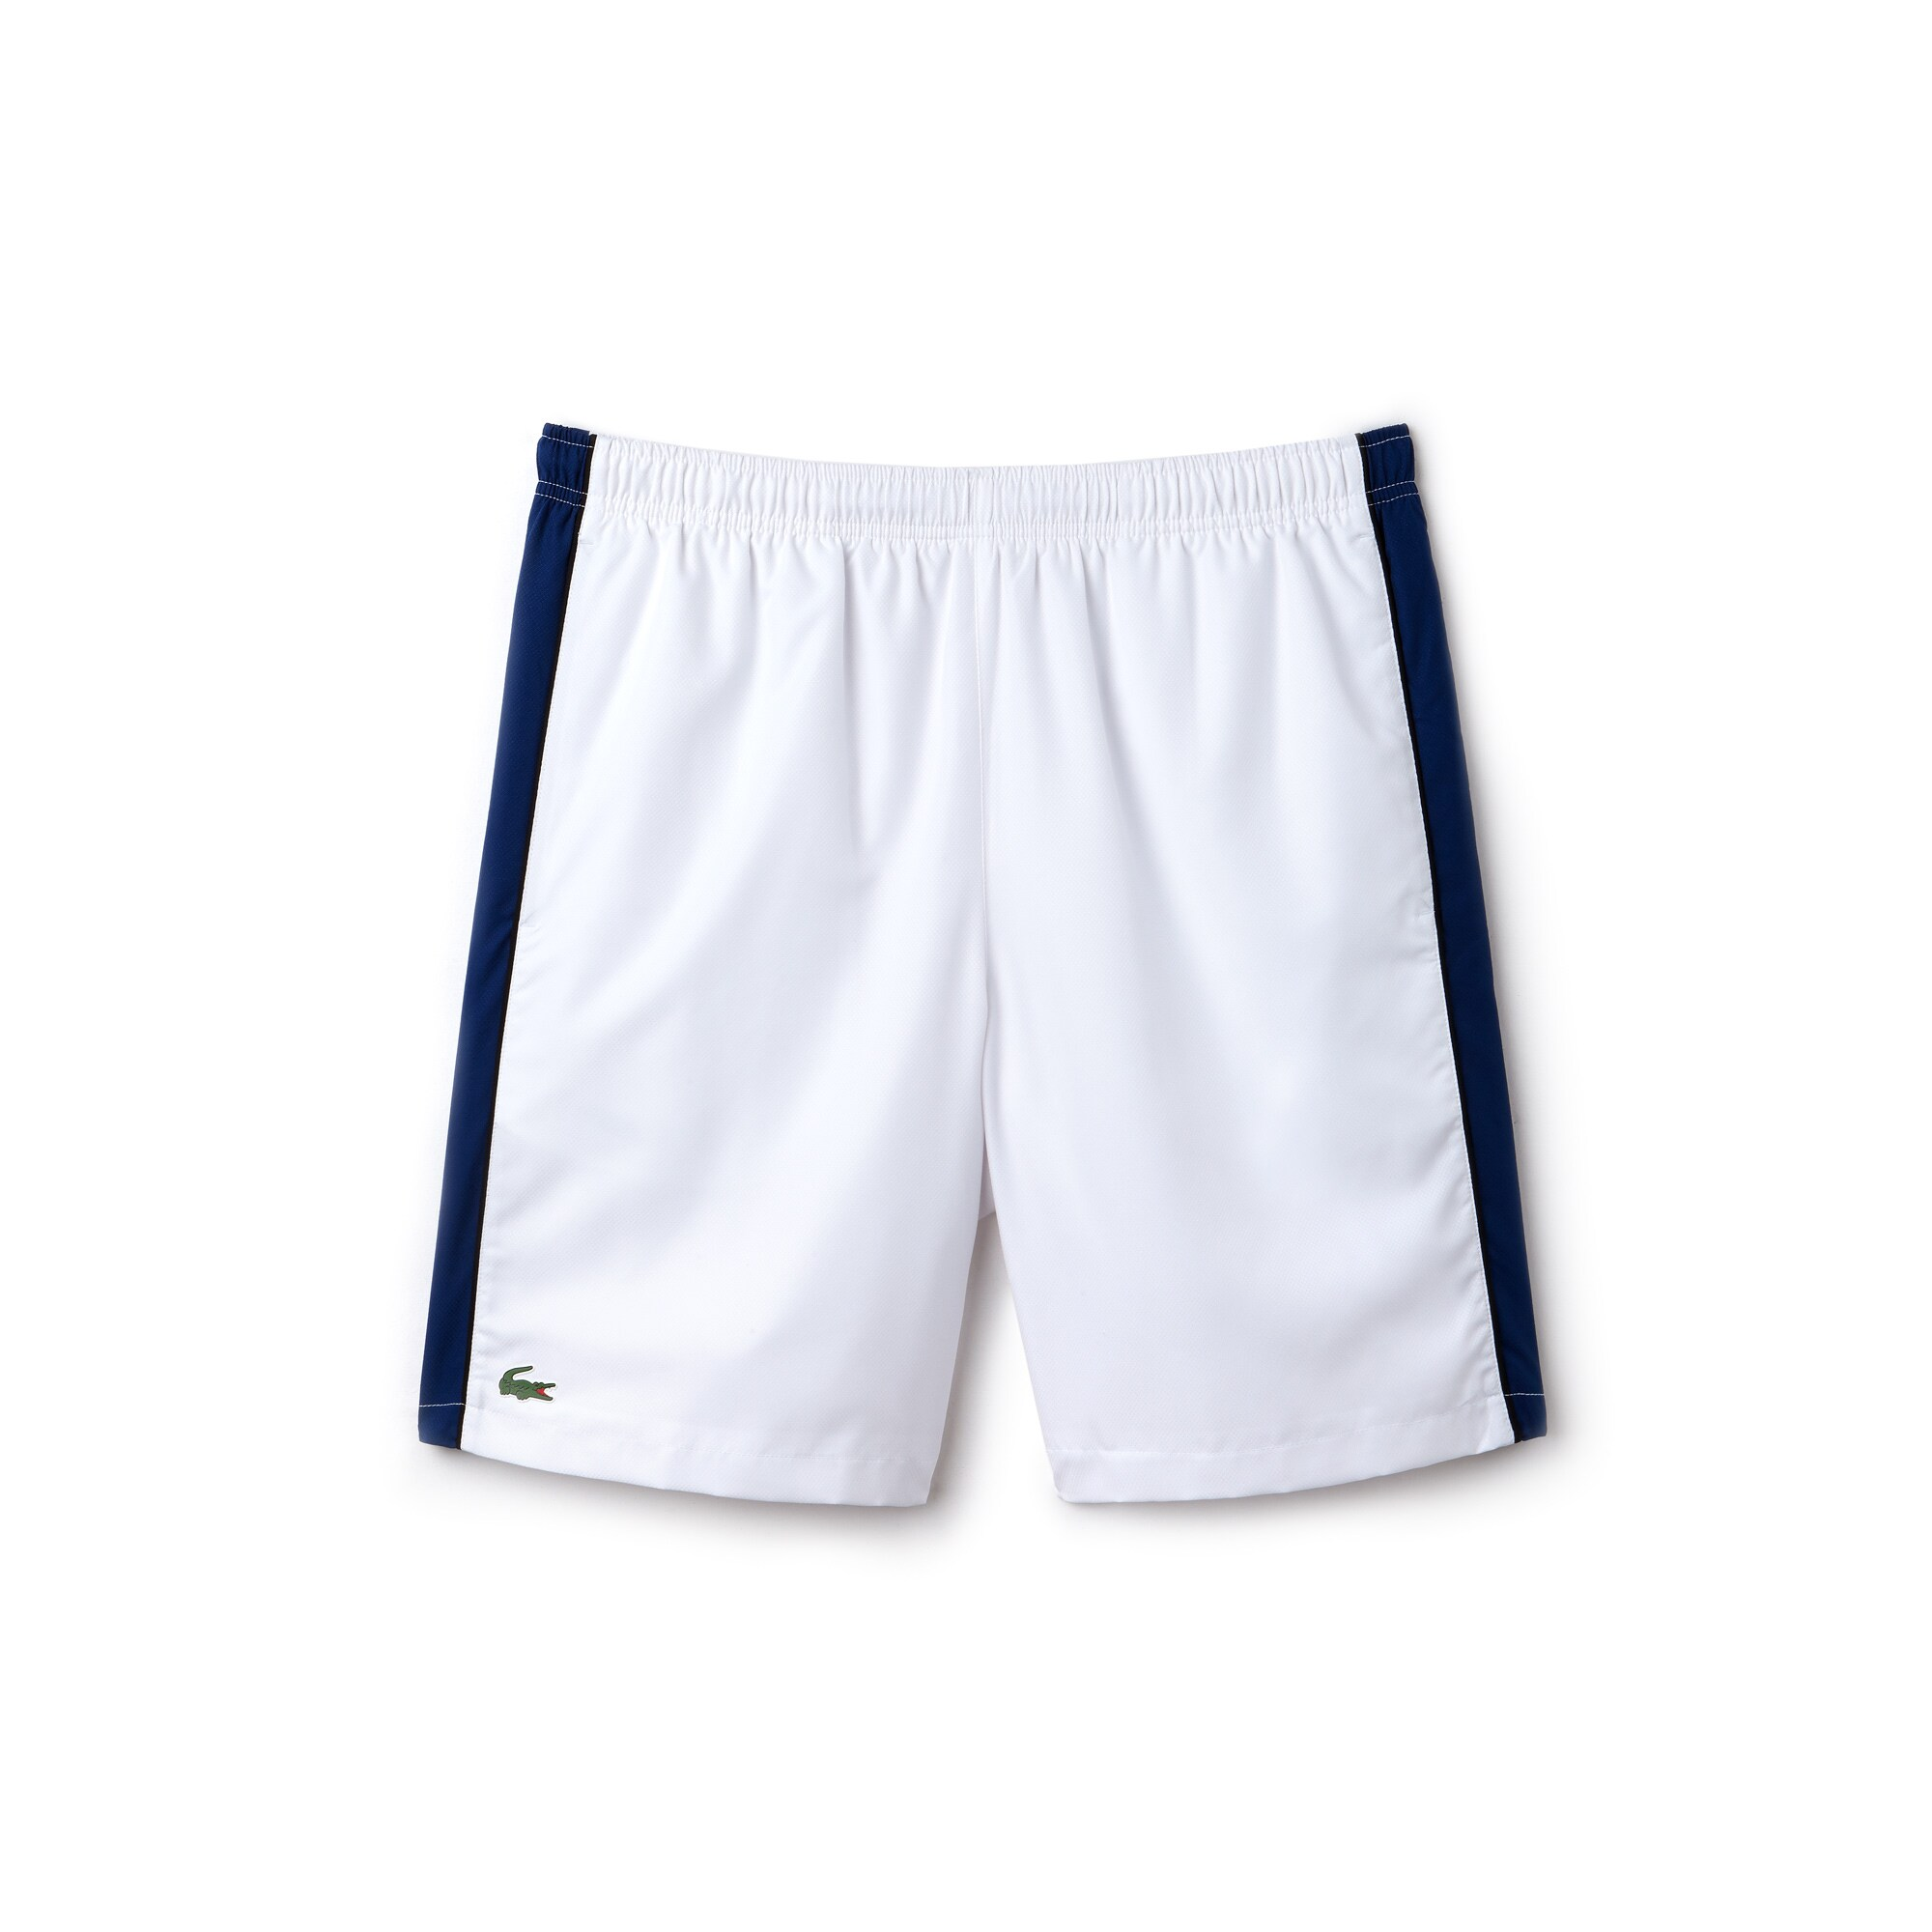 Men's LACOSTE SPORT NOVAK DJOKOVIC COLLECTION Colorblock Shorts